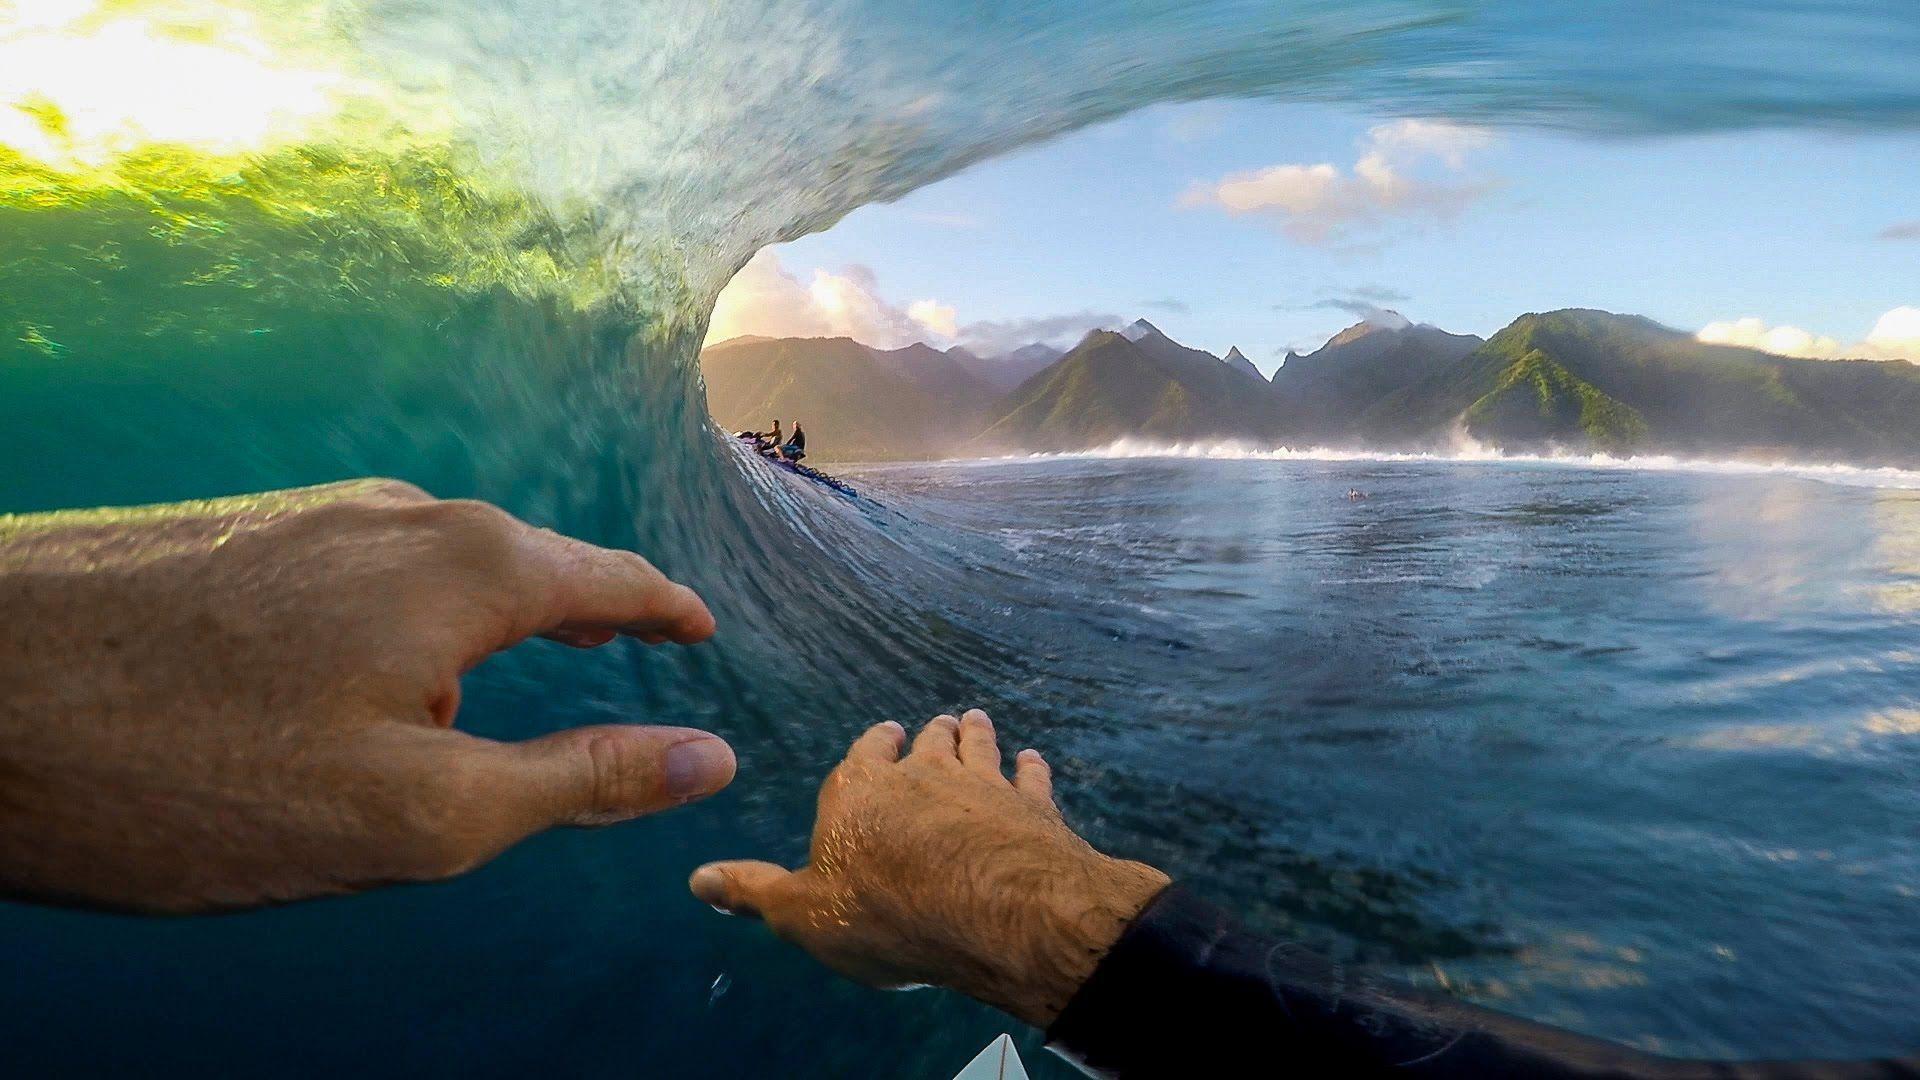 Teahupo'o Surf Wallpapers - Wallpaper Cave